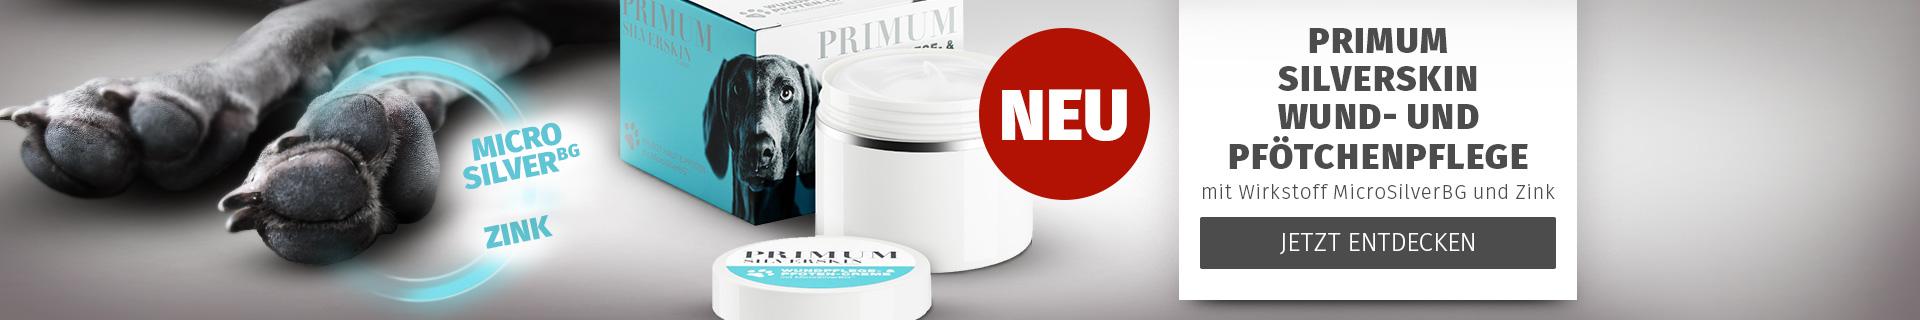 PRIMUM - Jetzt neu: SilverSkin Pfötchenpflege